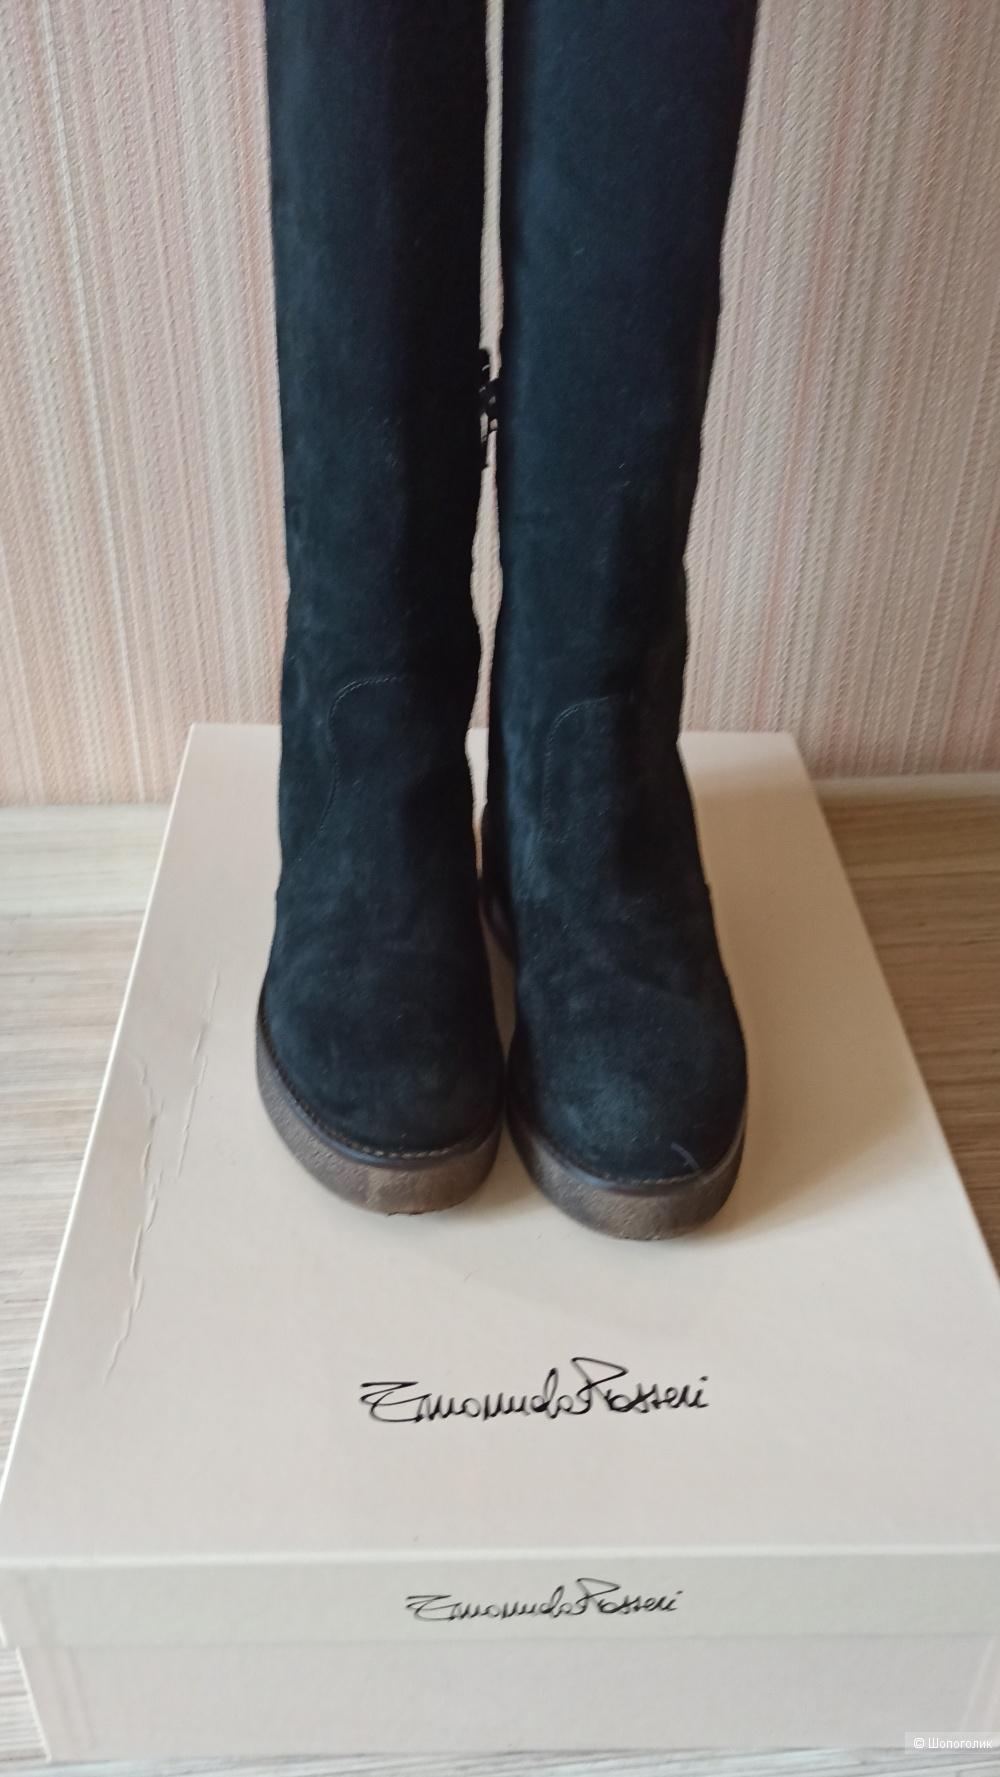 Сапоги осенние Emanuela Passeri 38 размер